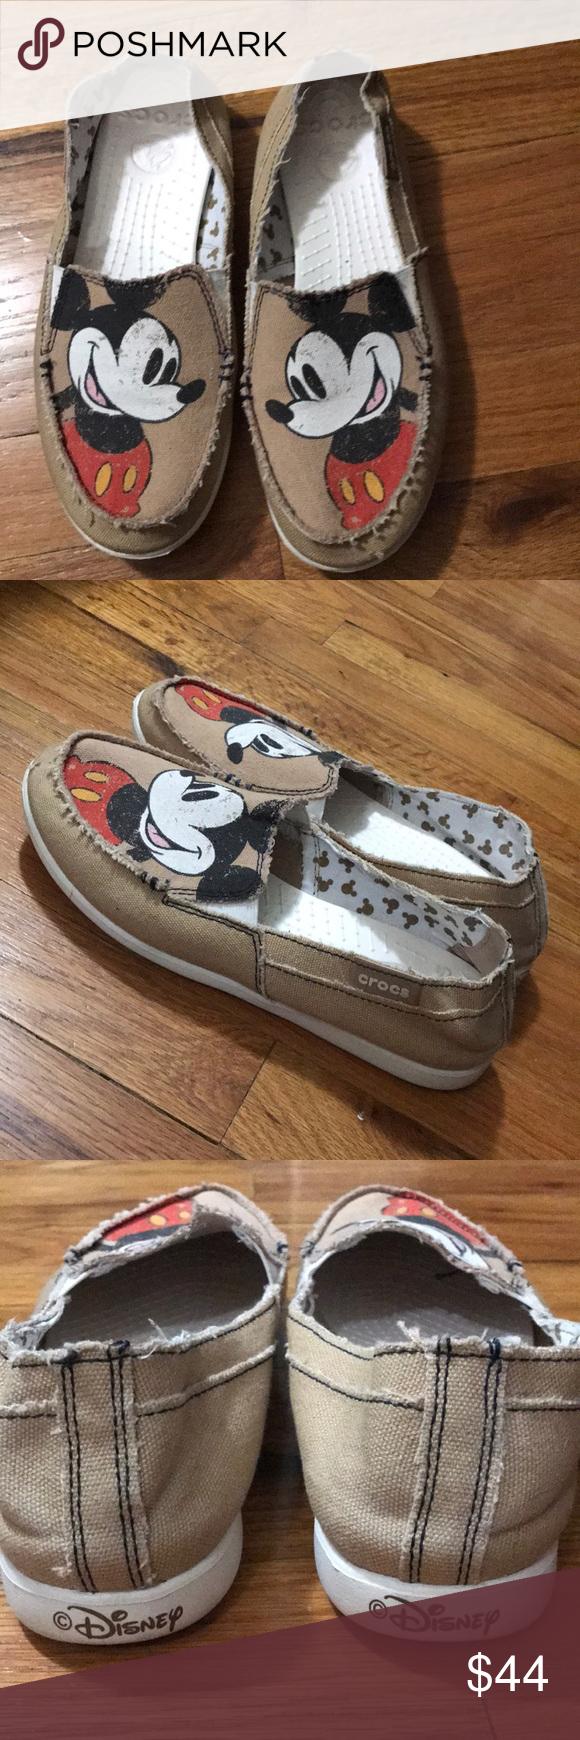 meet elegant shoes pre order EUC Mickey Mouse Crocs Size 8 Tan, slip-on canvas Melbourne Disney ...